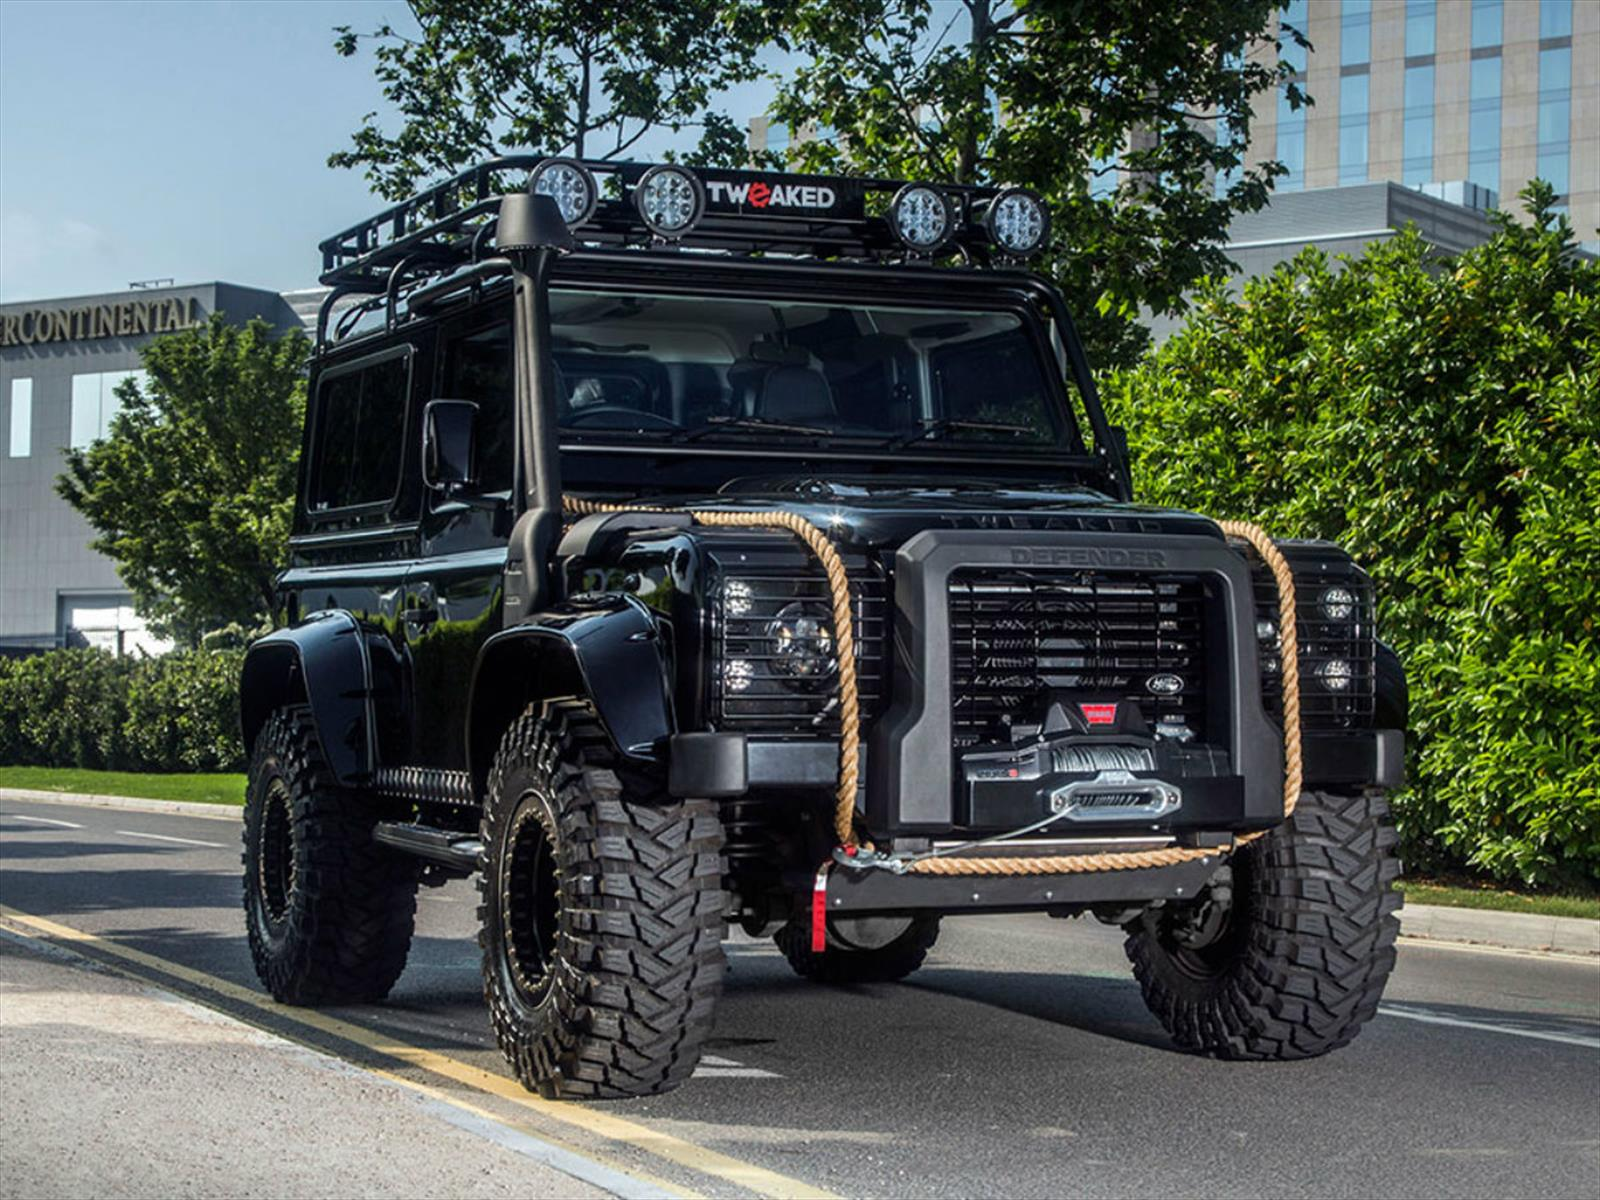 Spectre Edition Land Rover Defender 90, con espíritu James Bond